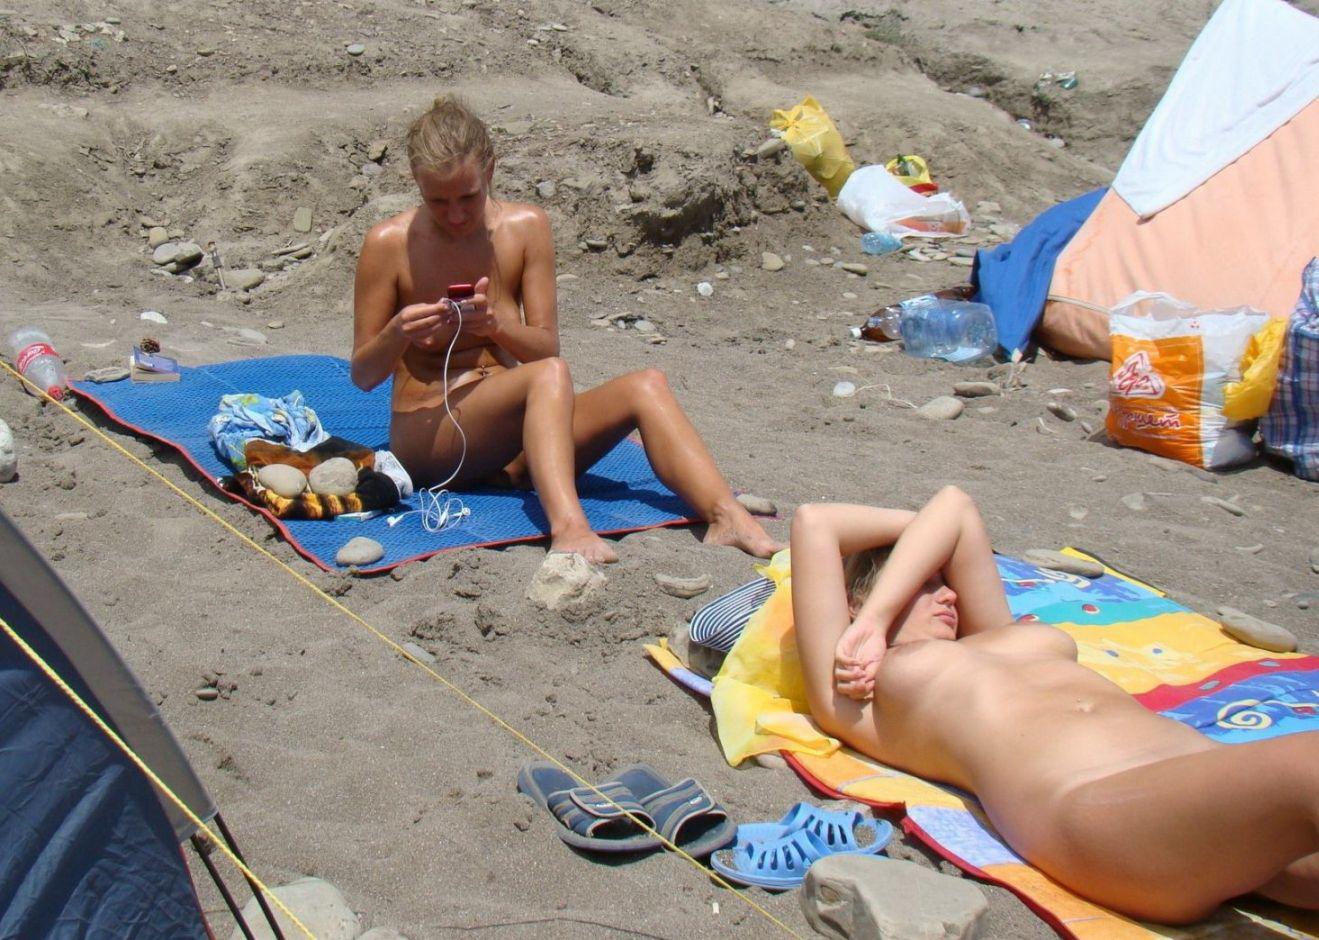 Amateur nude beach voyeur sluts enjoying the warm sun 1